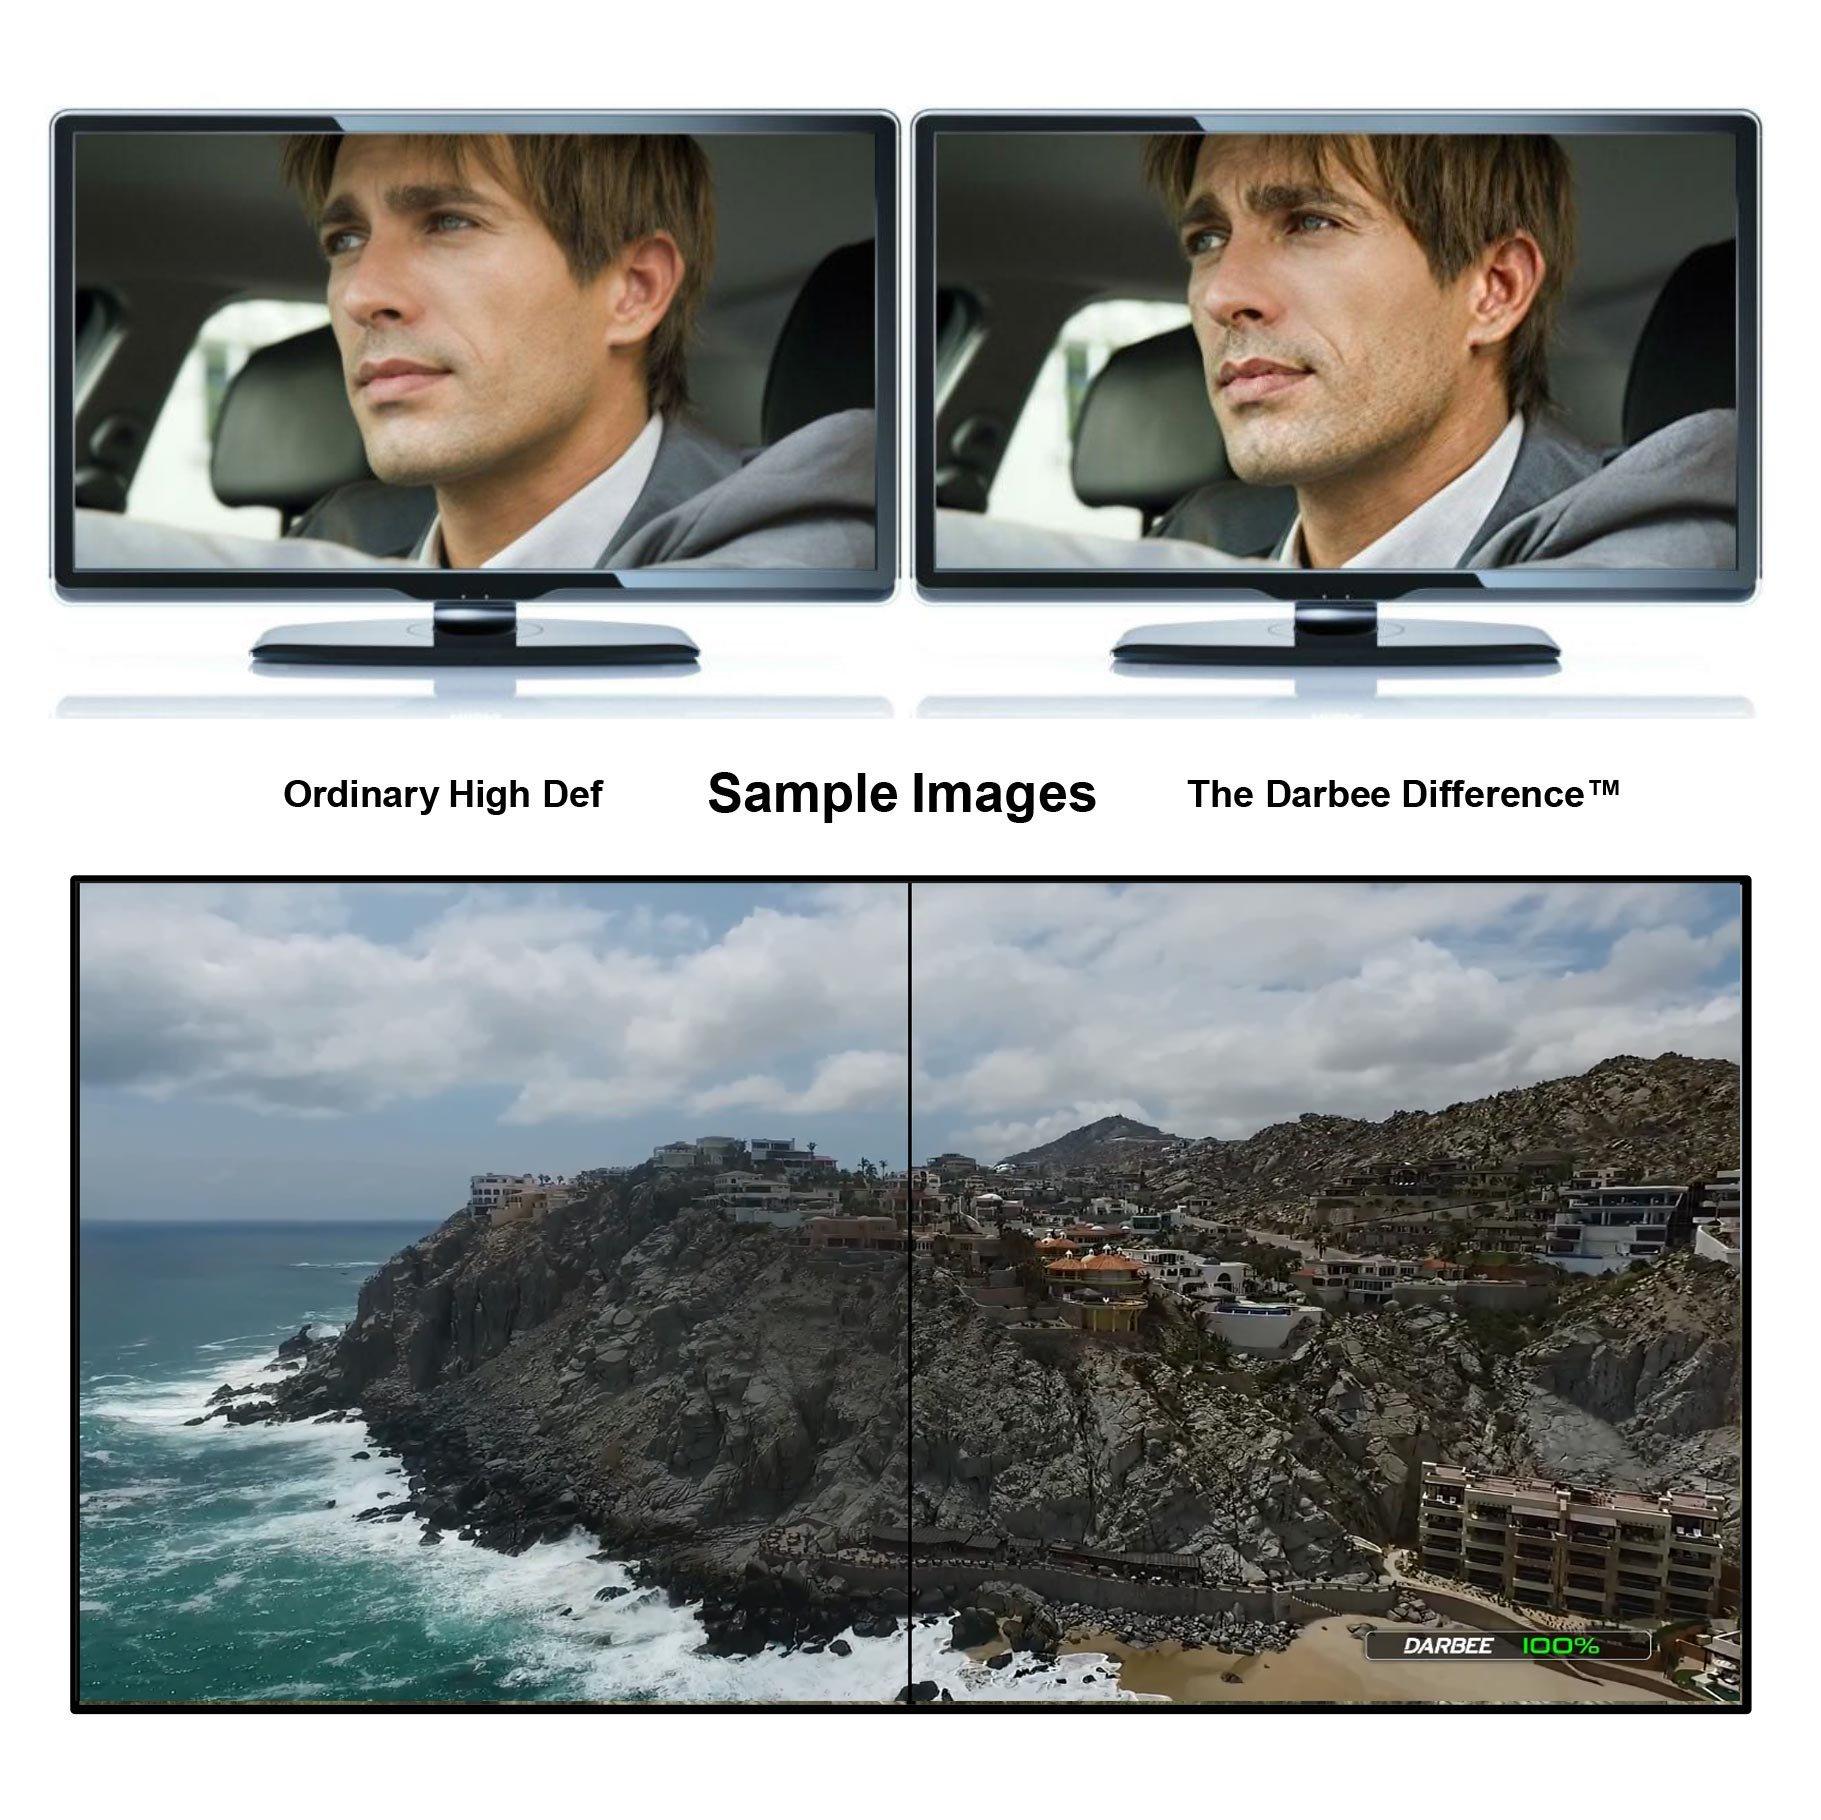 DarbeeVision DVP-5000S Visual Presence HDMI Video Processor - Enhances Video, Projector and Digital TV Clarity